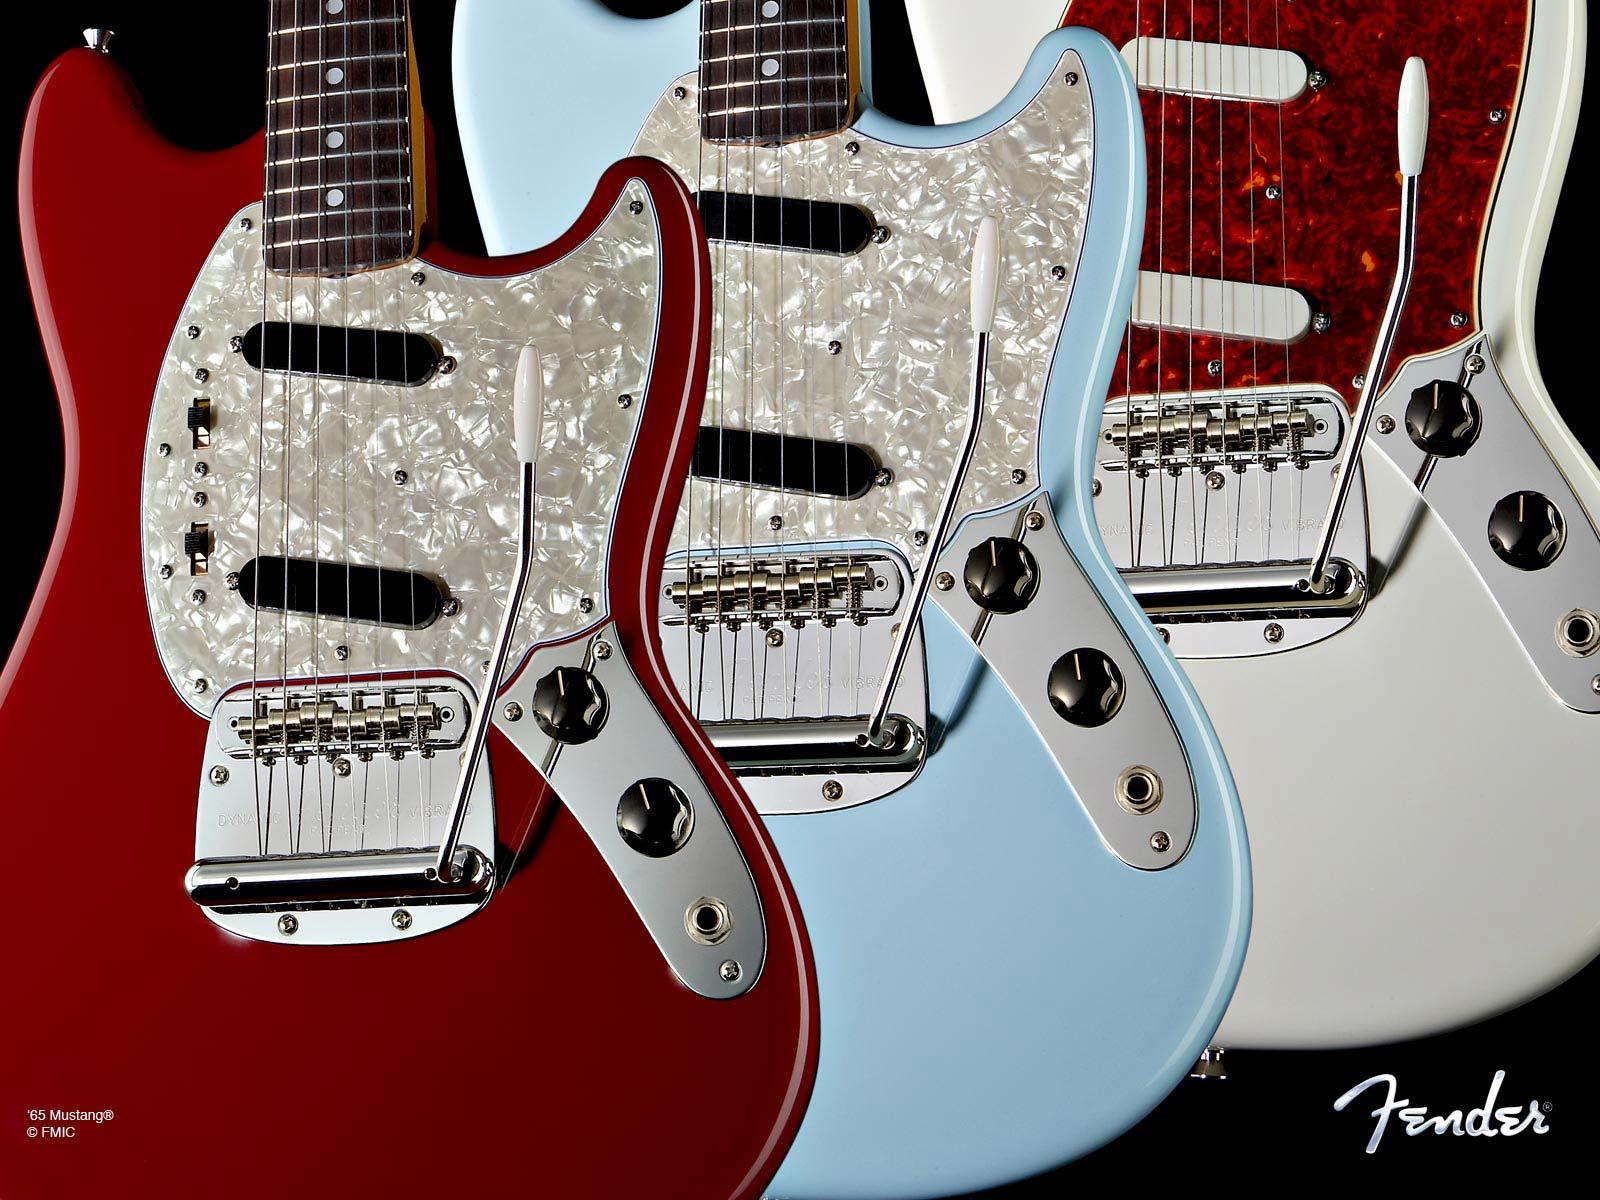 Guitar Guitar 1600x1200